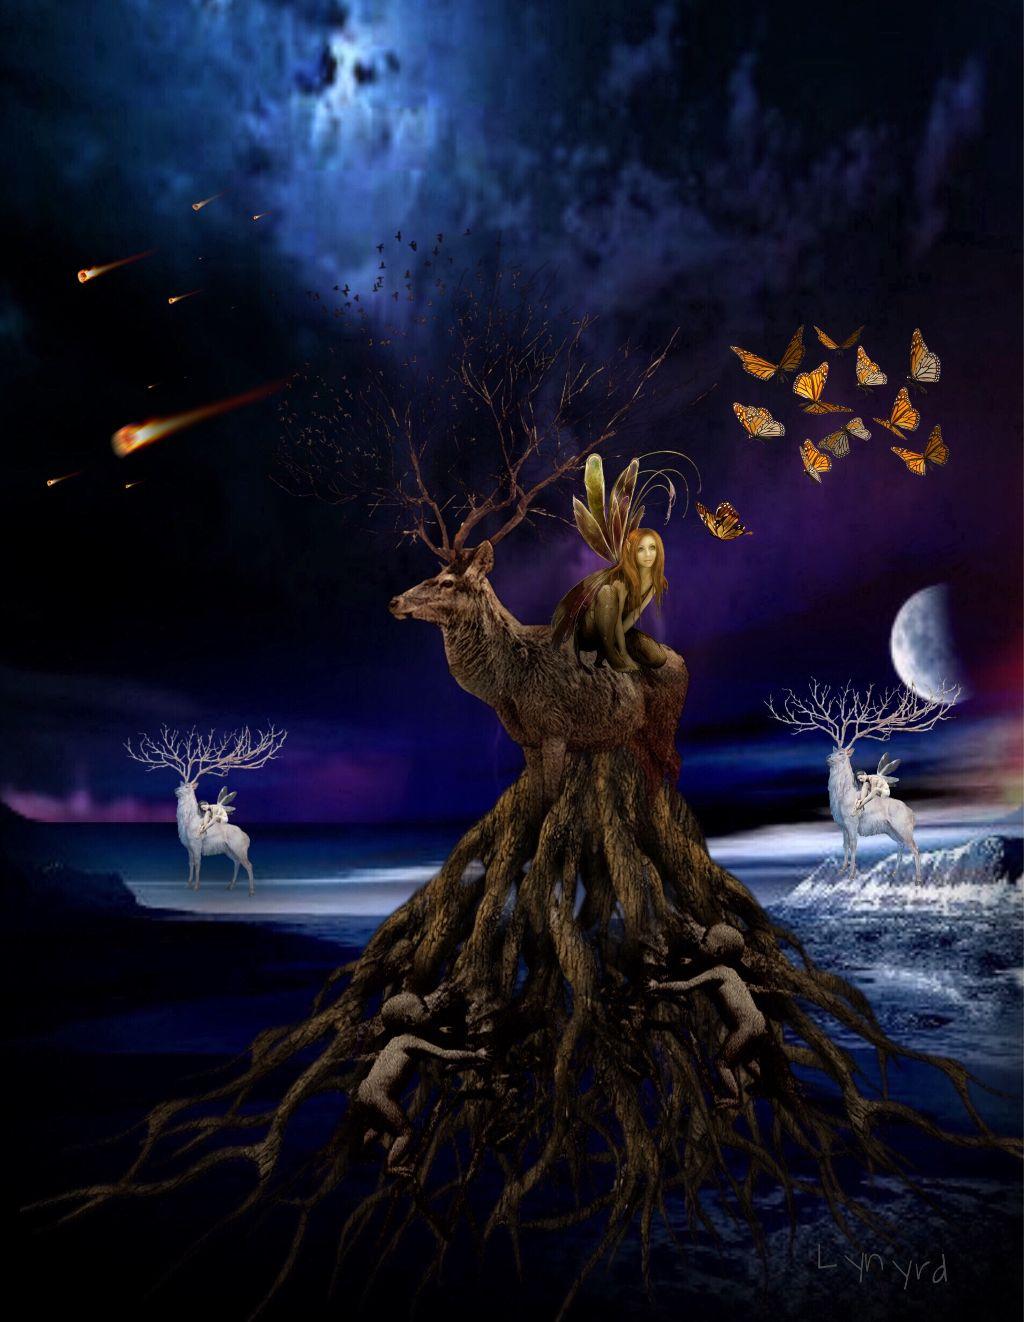 #freetoedit #deer #fantasy #art #myedit #madewithpicsart #awesomesticker